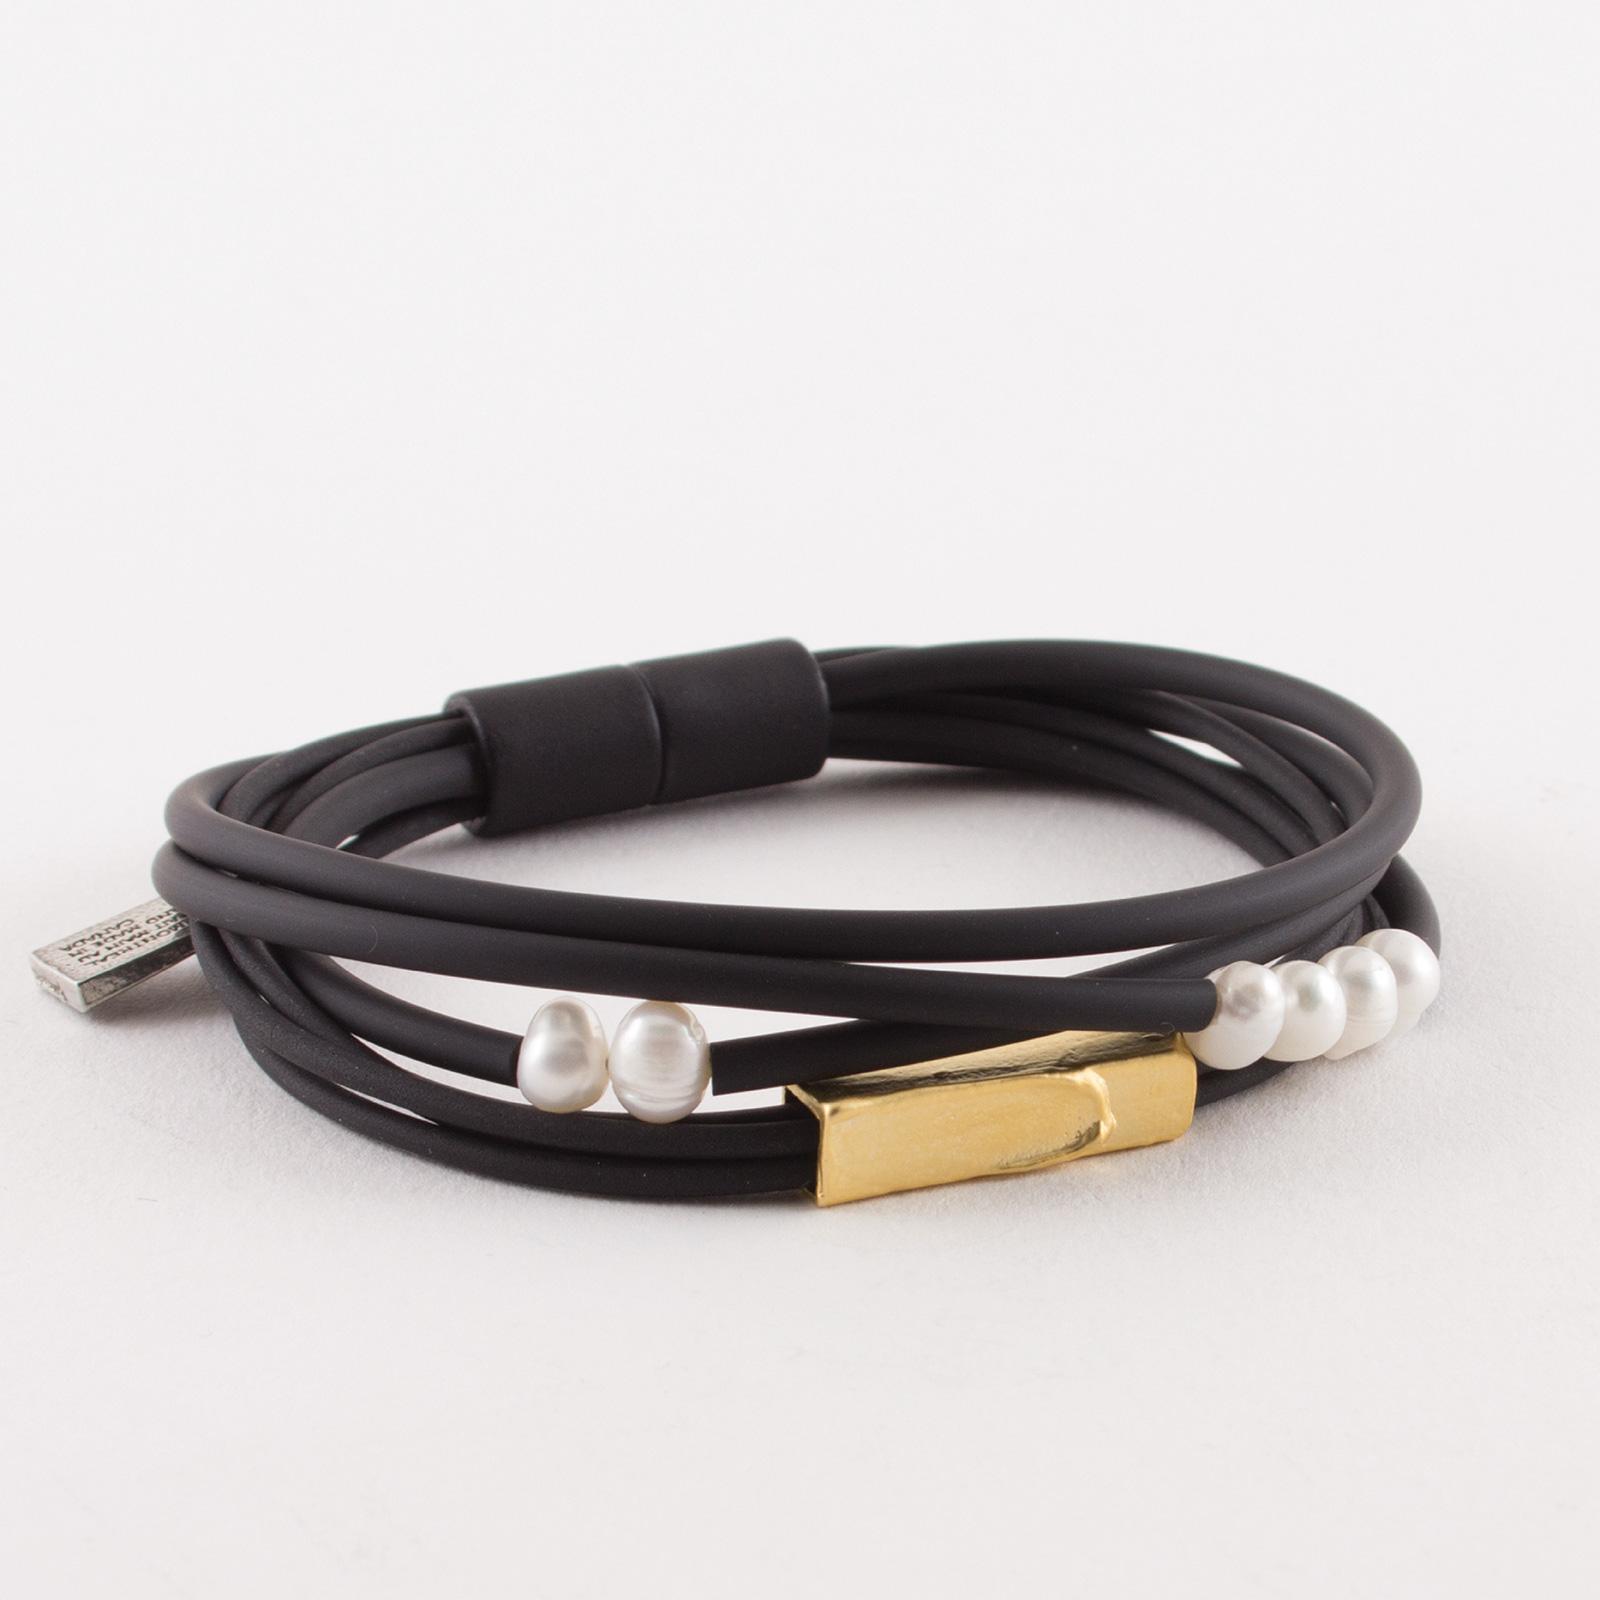 AnneMarieChagnon_2018_Bracelets_Folam_Or-Gold_Perle-Pearl_PVC-1.jpg